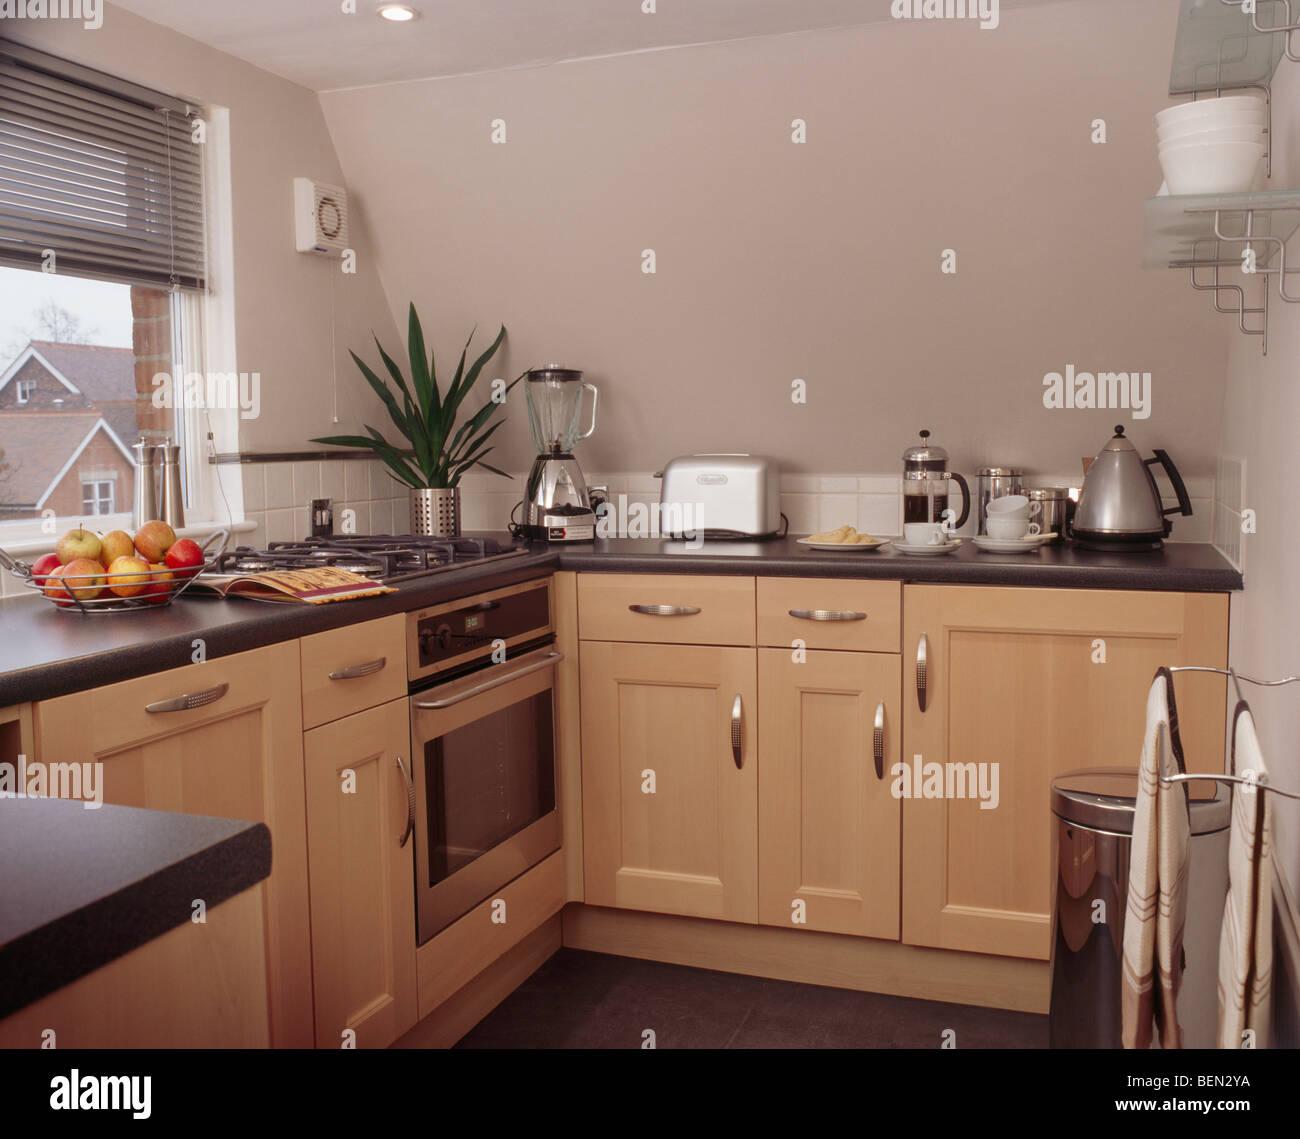 Madera pálida unidades montadas en un pequeño apartamento con cocina ...